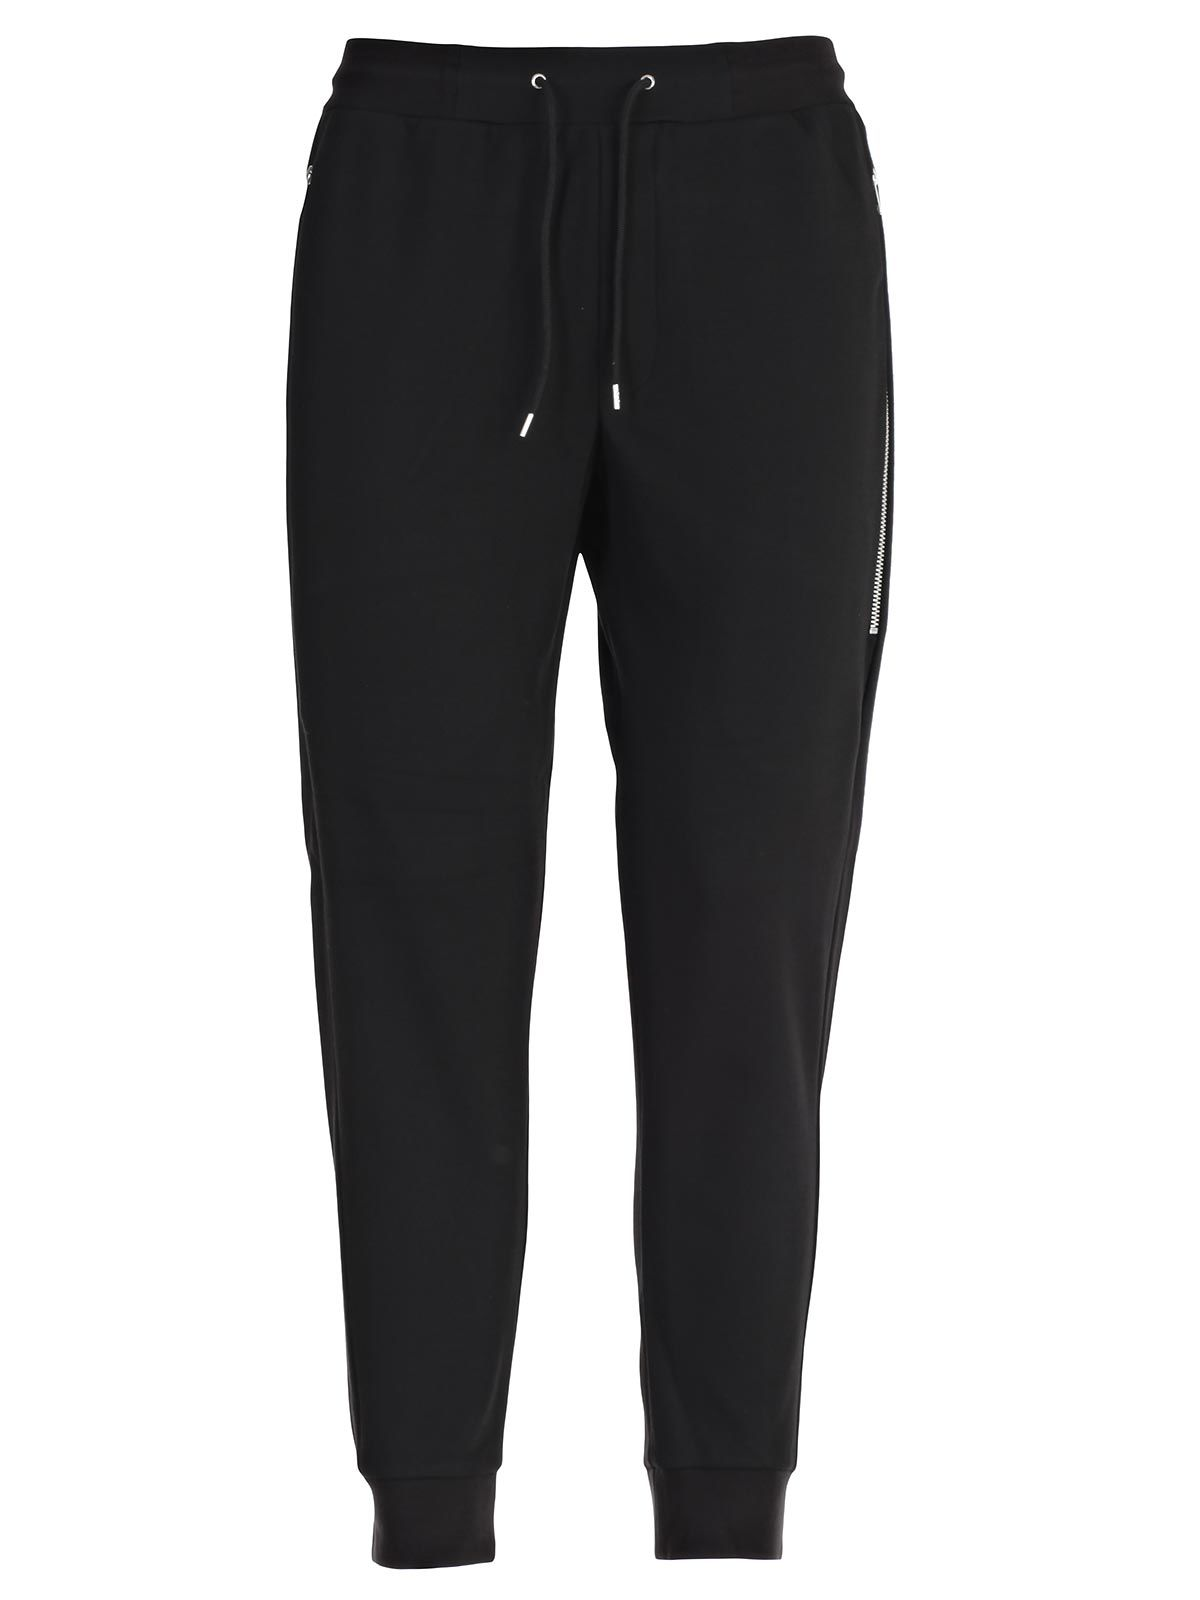 McQ Alexander McQueen Trousers